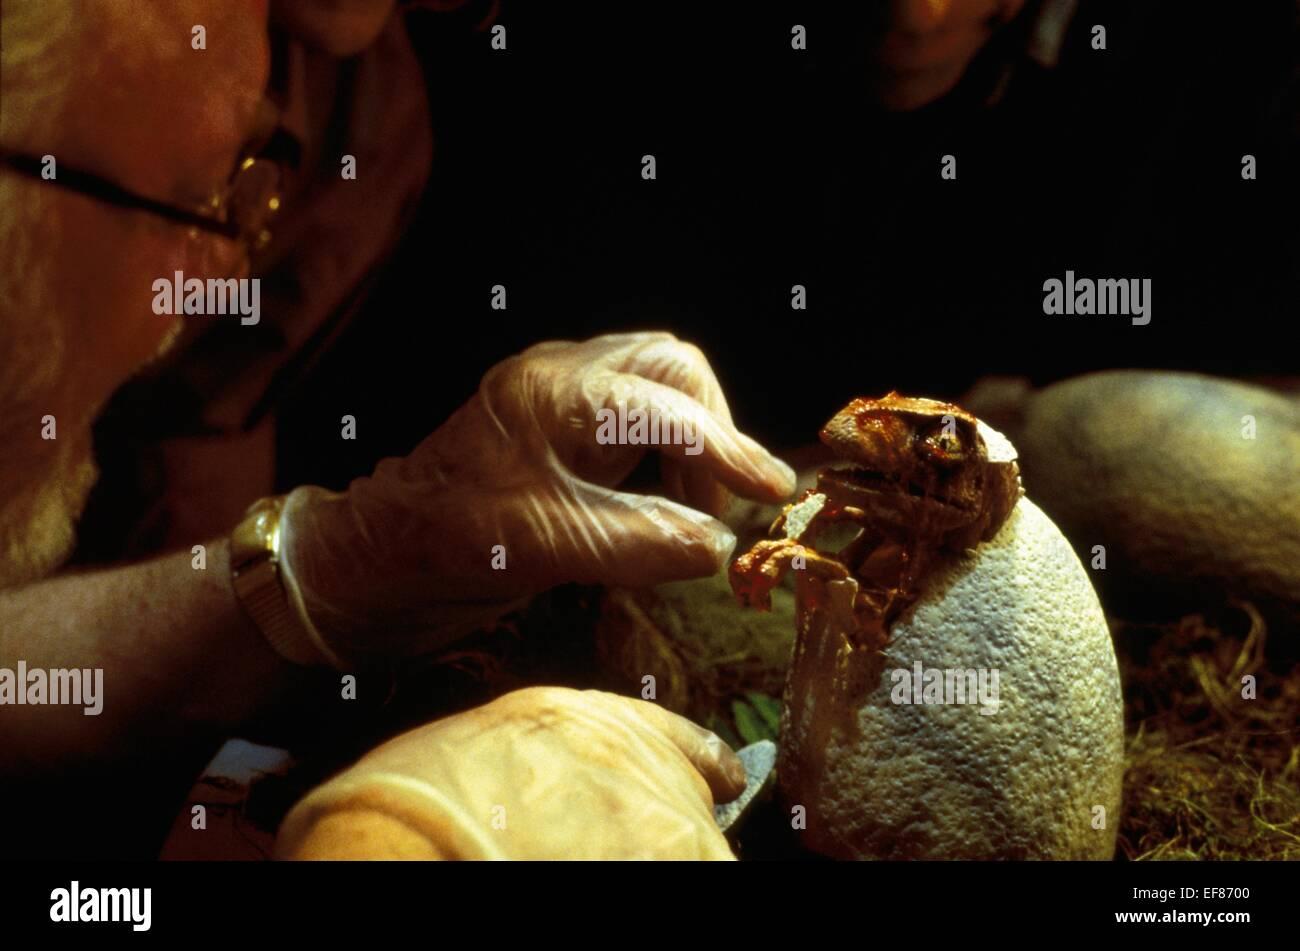 HATCHING DINOSAUR JURASSIC PARK (1993) - Stock Image